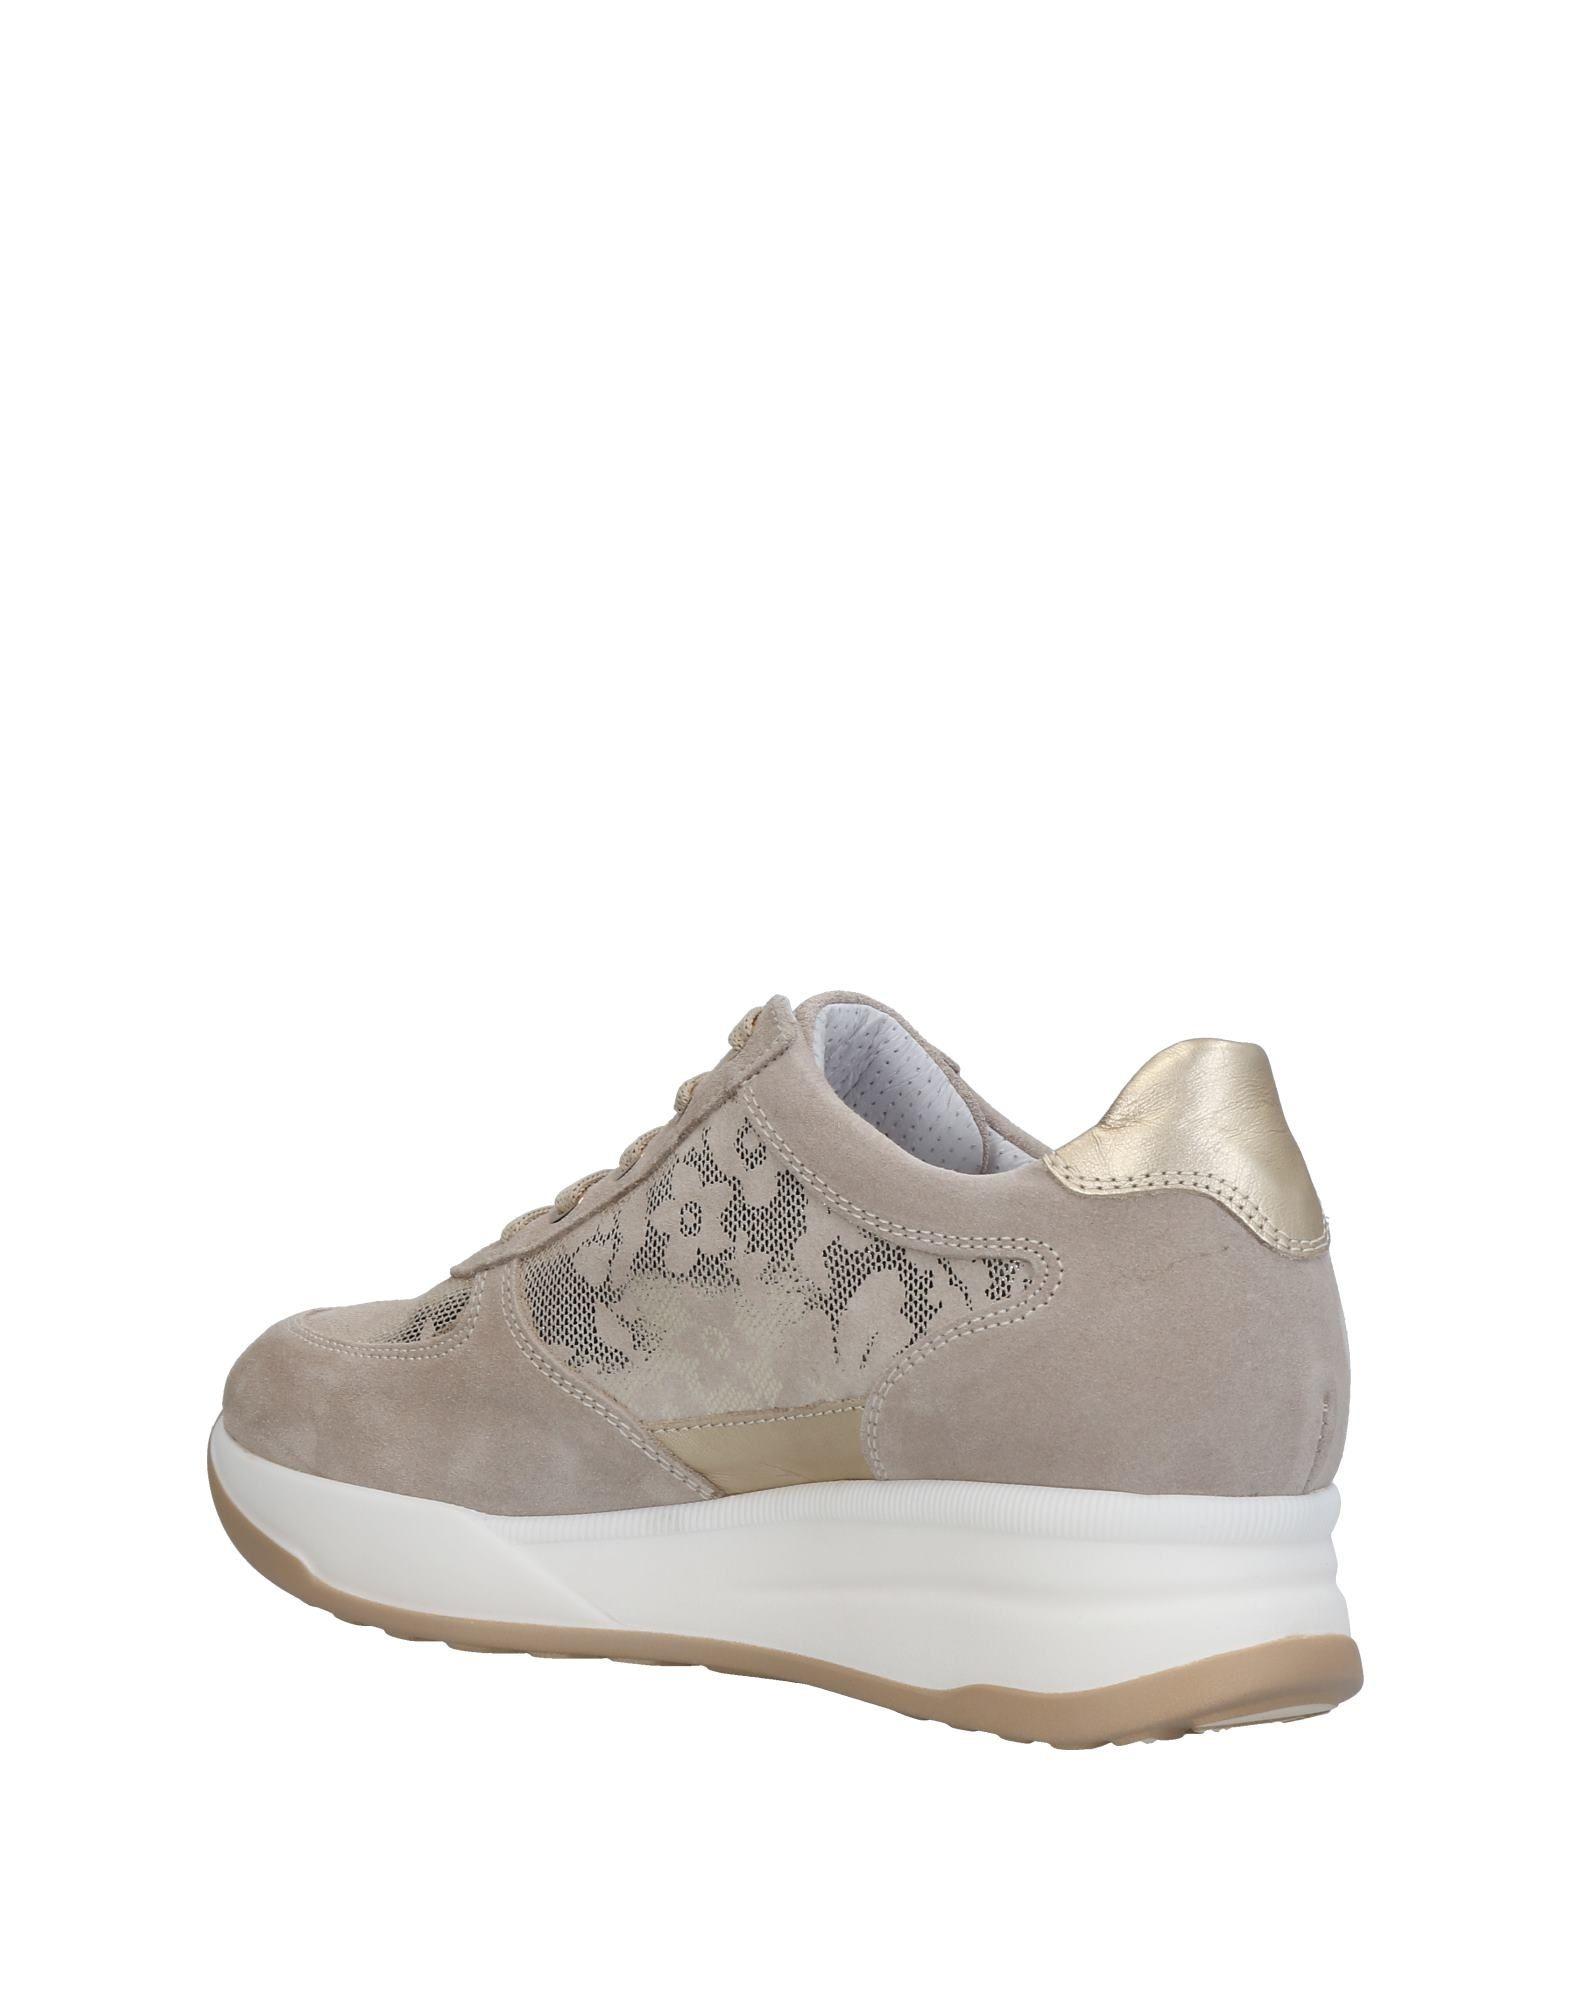 Sneakers Andrea Morelli Femme - Sneakers Andrea Morelli sur